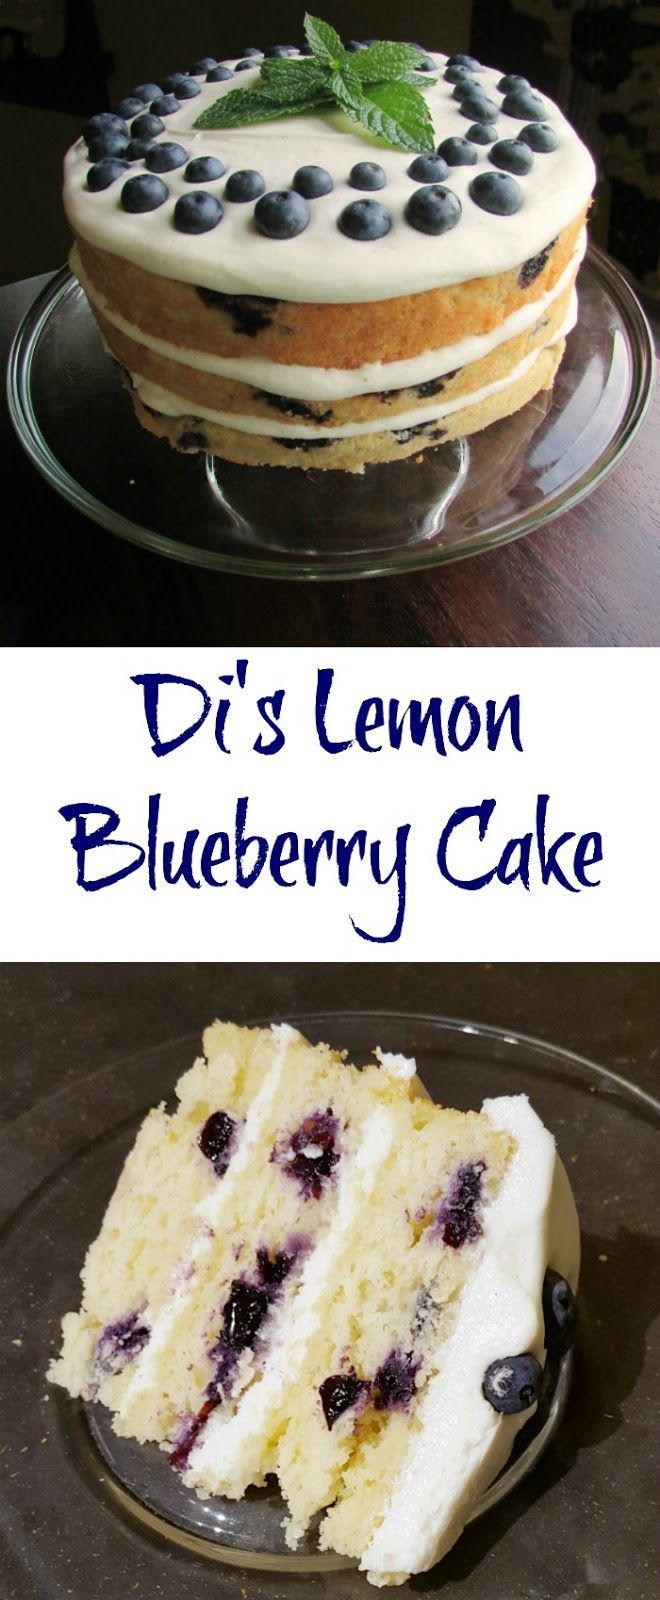 Di's Lemon Blueberry Cake | Cream cheeses, It is and Lemon ...